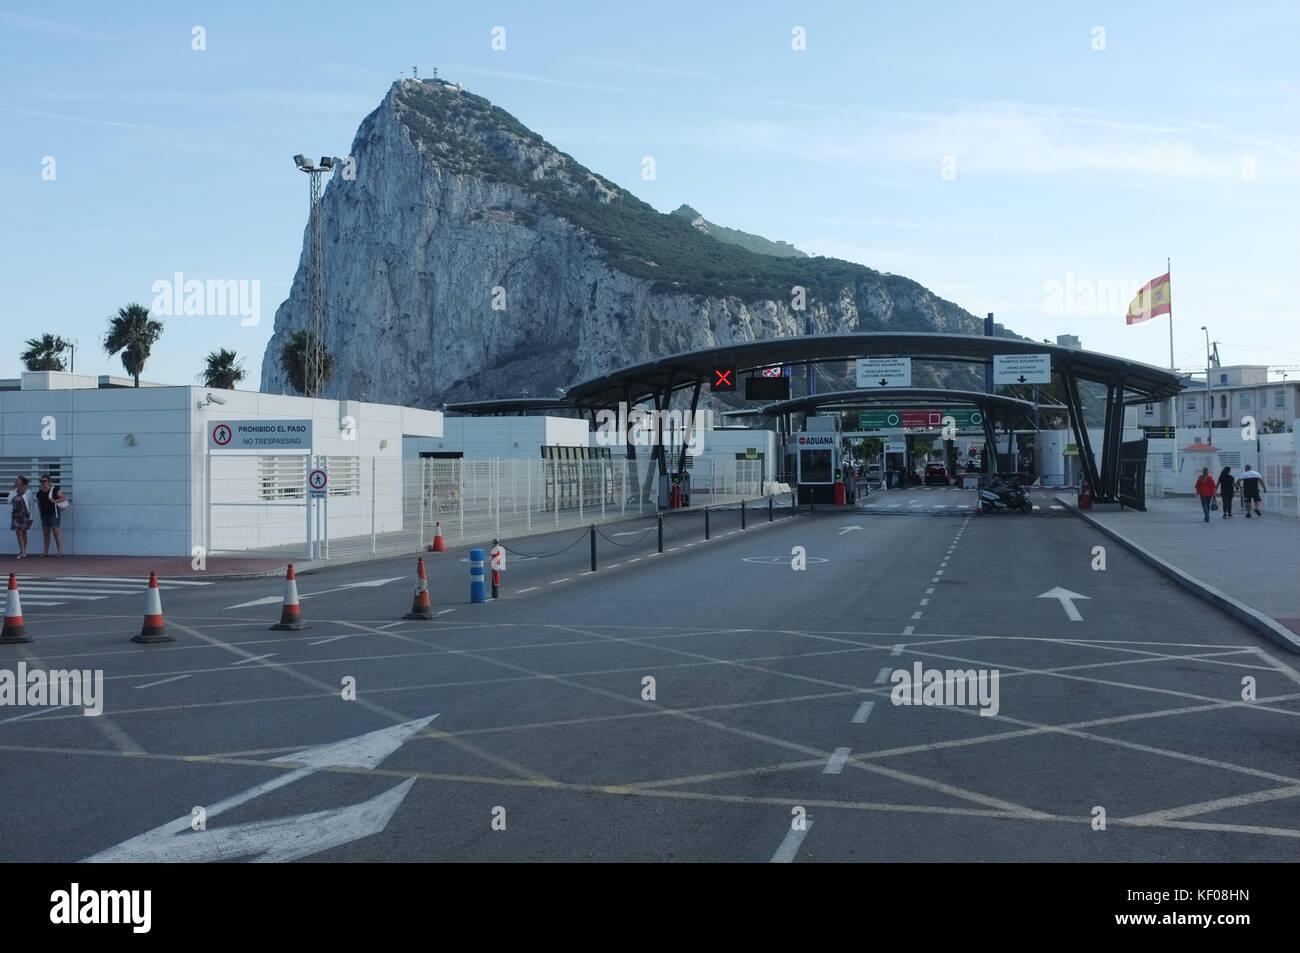 The border with Spain entering Gibraltar, September 2017 - Stock Image